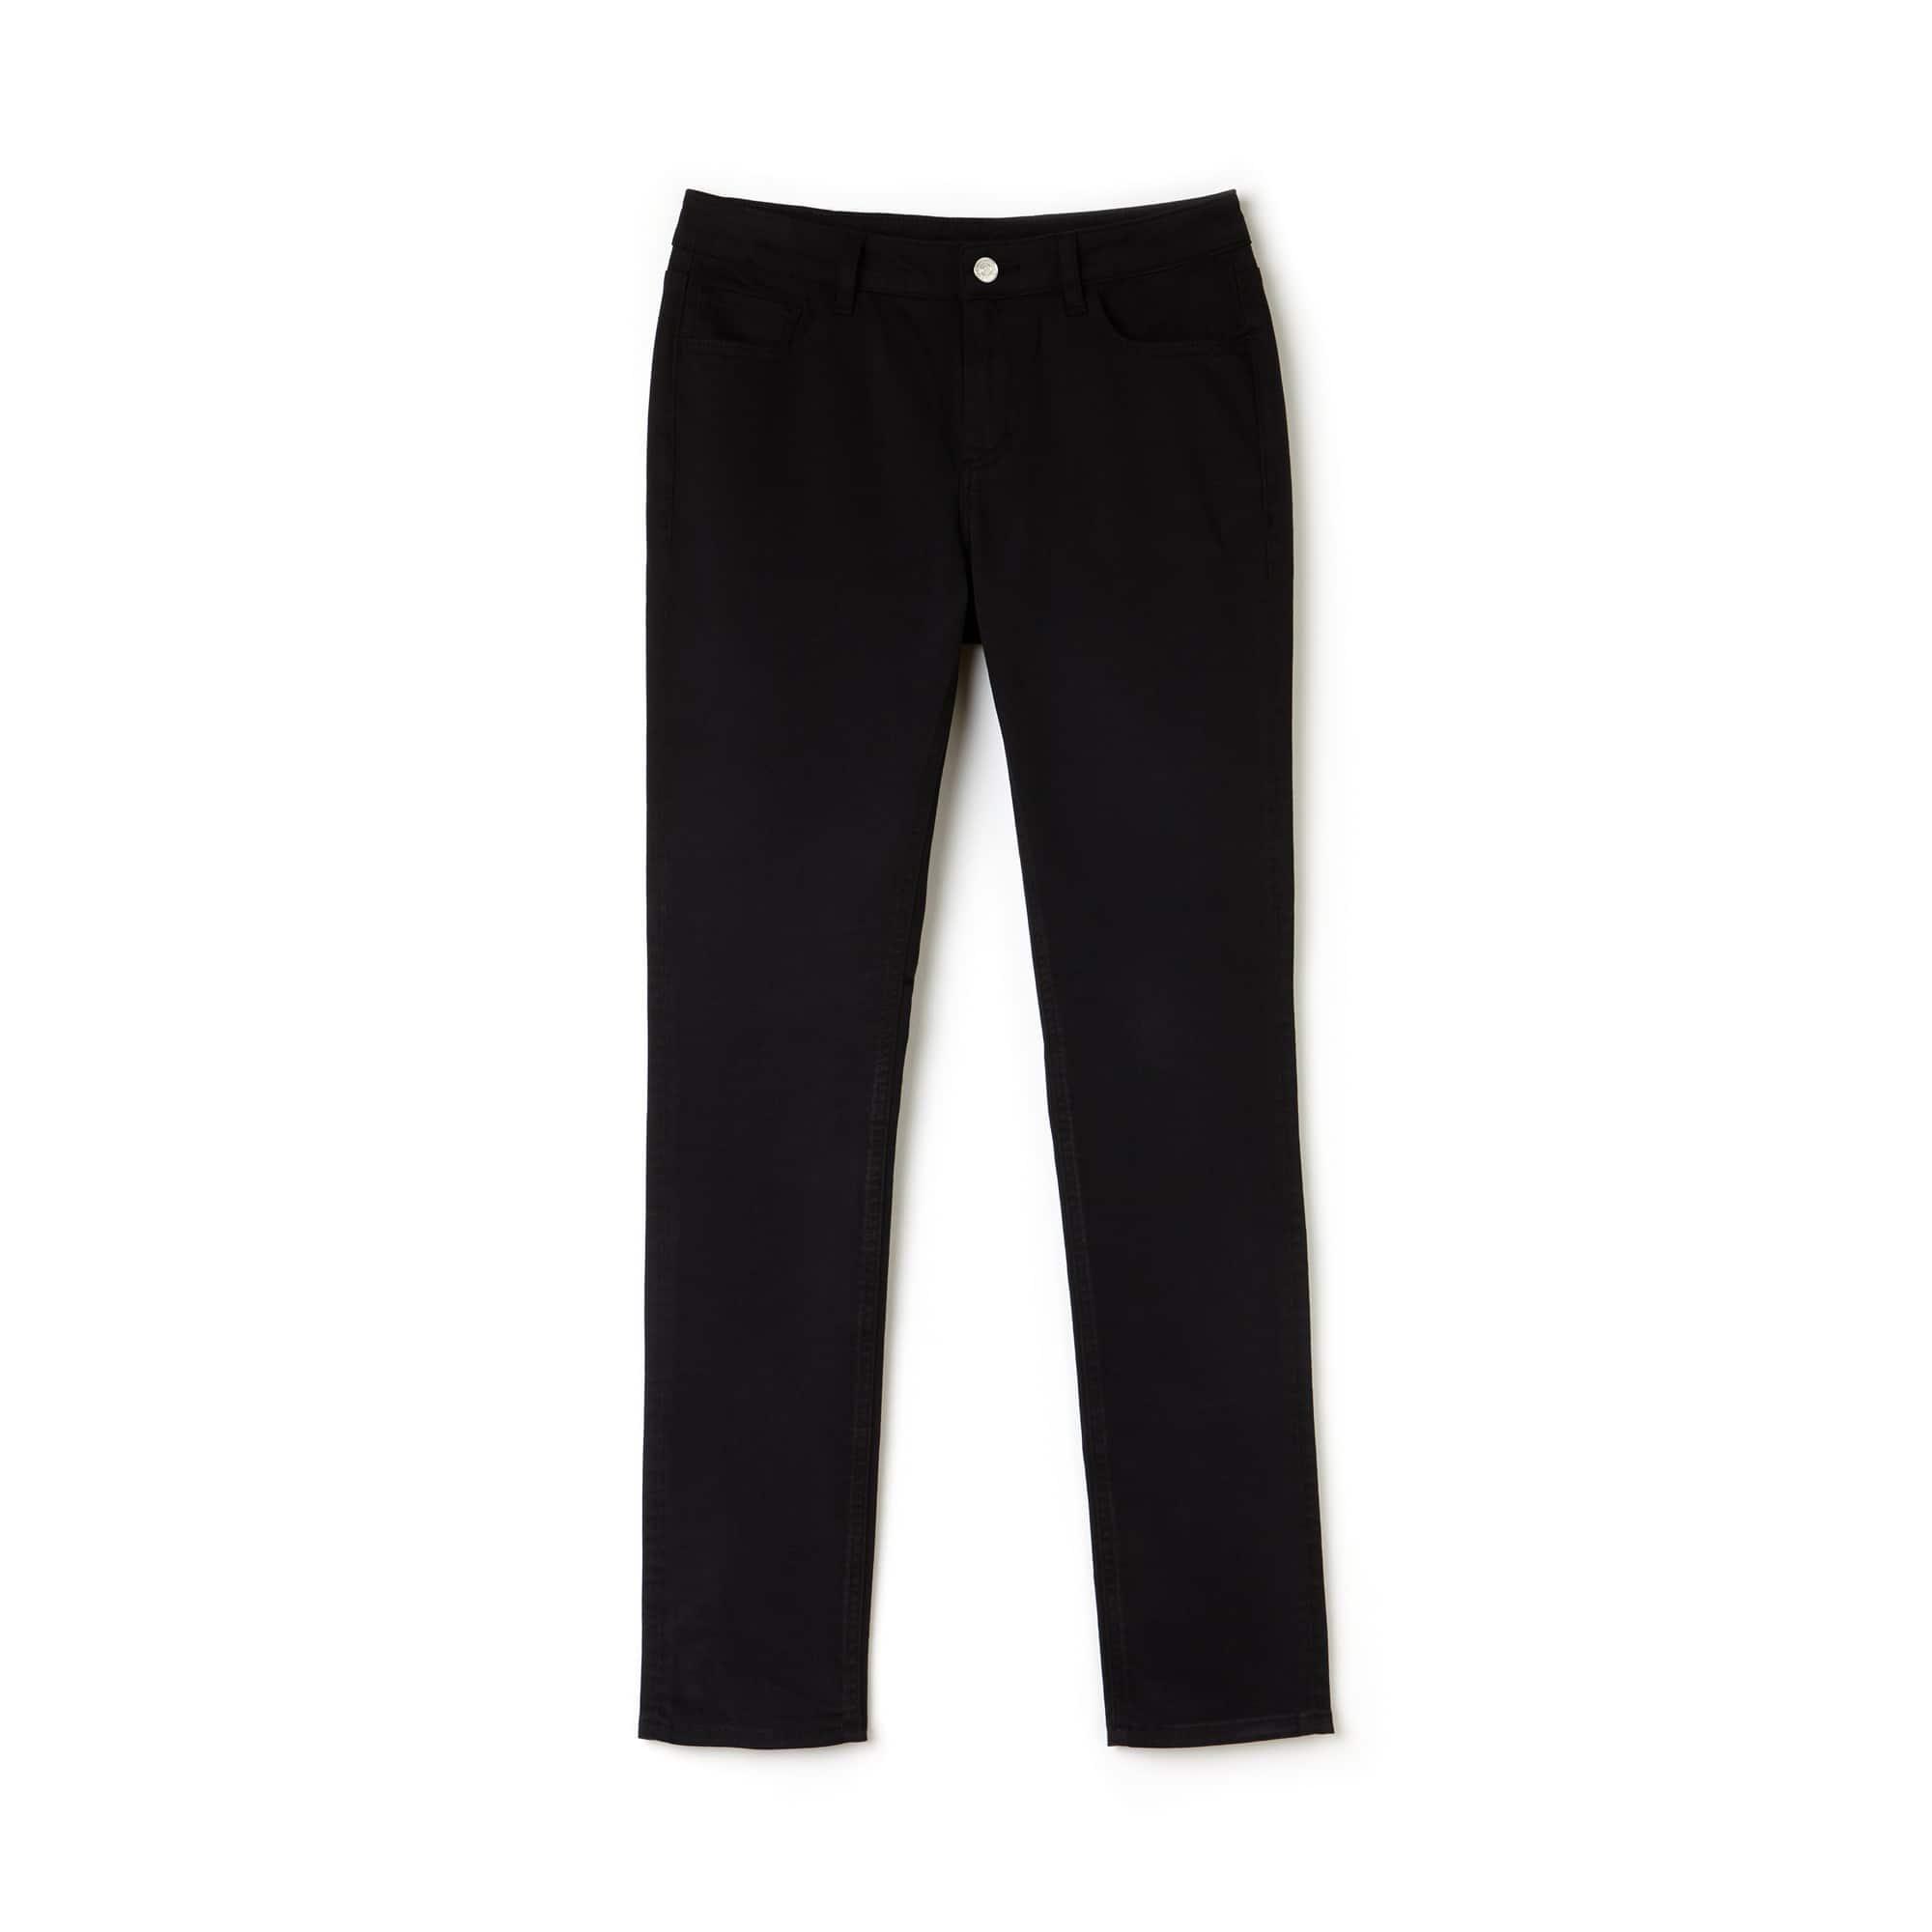 Pantalones Vaqueros Slim Fit